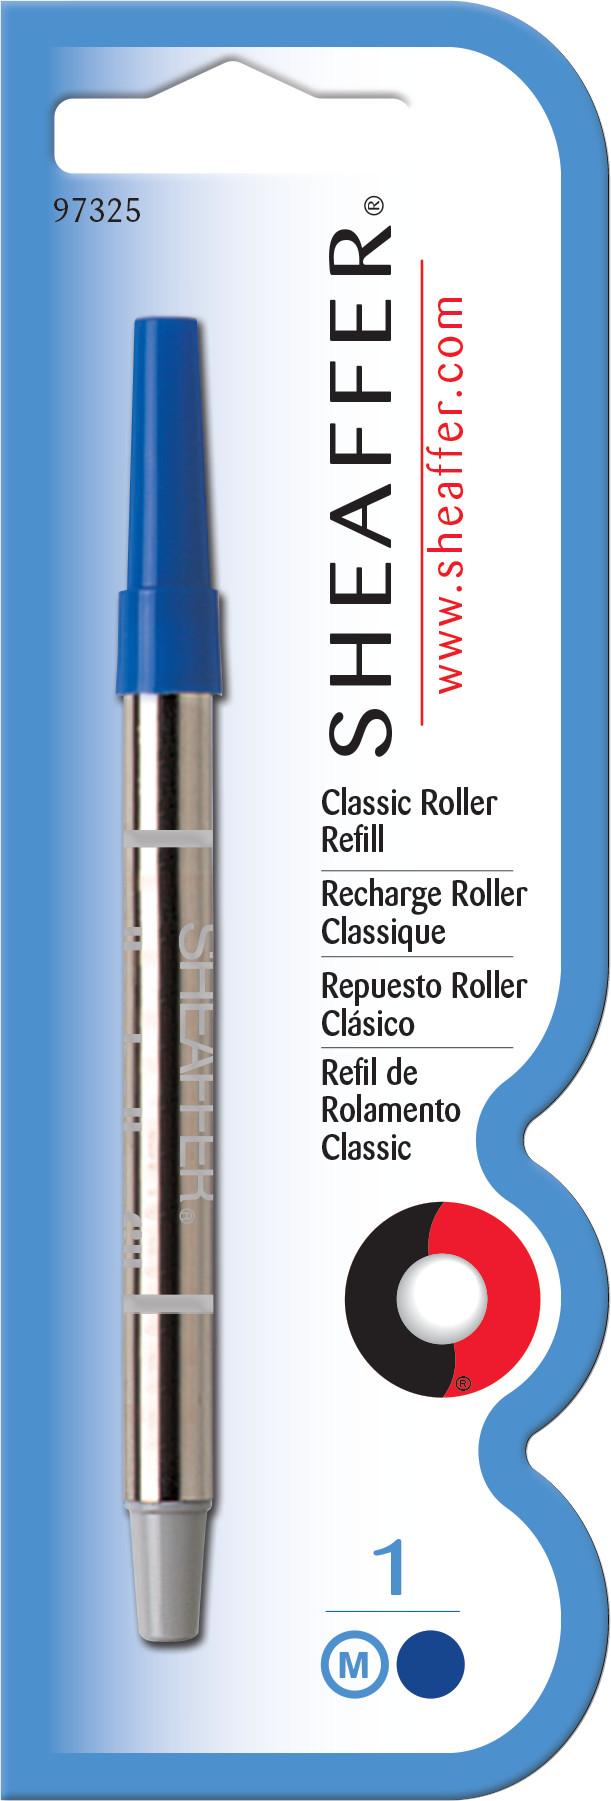 Sheaffer® Classic Rollerball Refill - Blue Medium - Blister Card